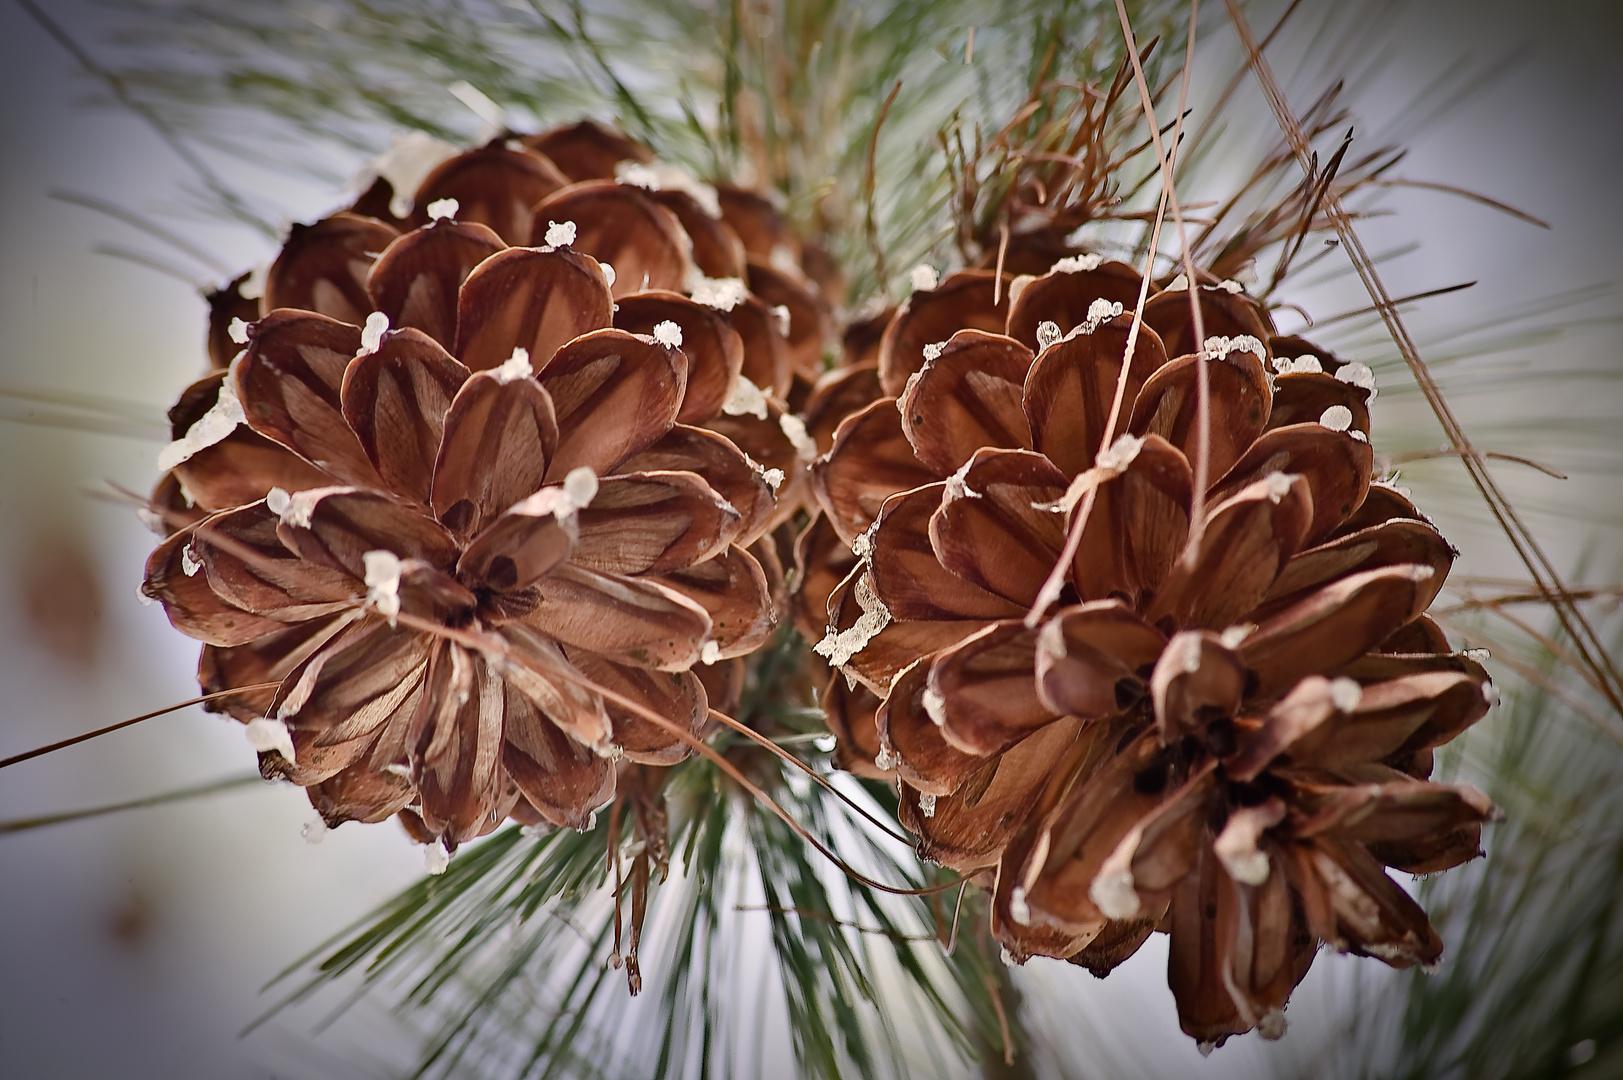 kiefer zapfen ganz gross foto bild pflanzen pilze flechten b ume blatt bl te bilder. Black Bedroom Furniture Sets. Home Design Ideas